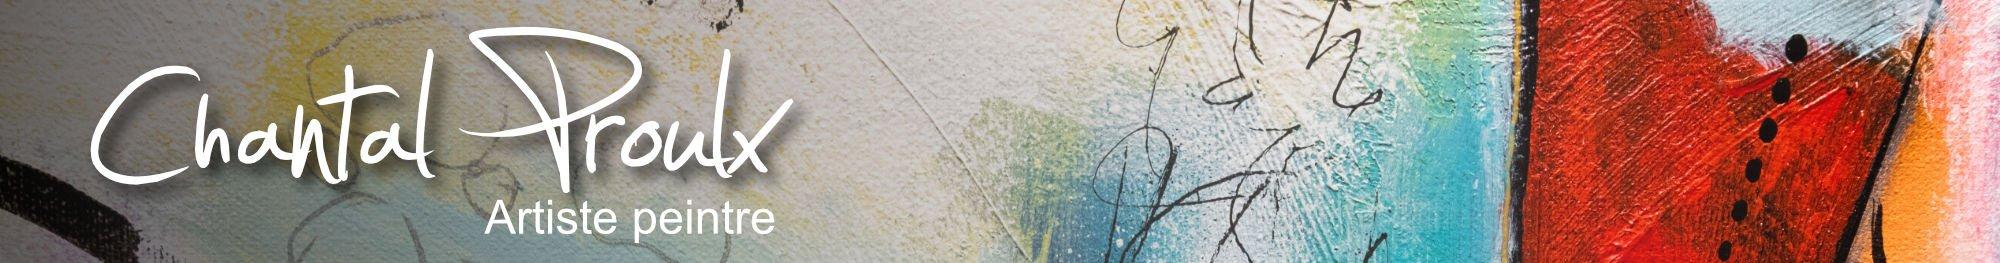 Chantal Proulx – artiste peintre